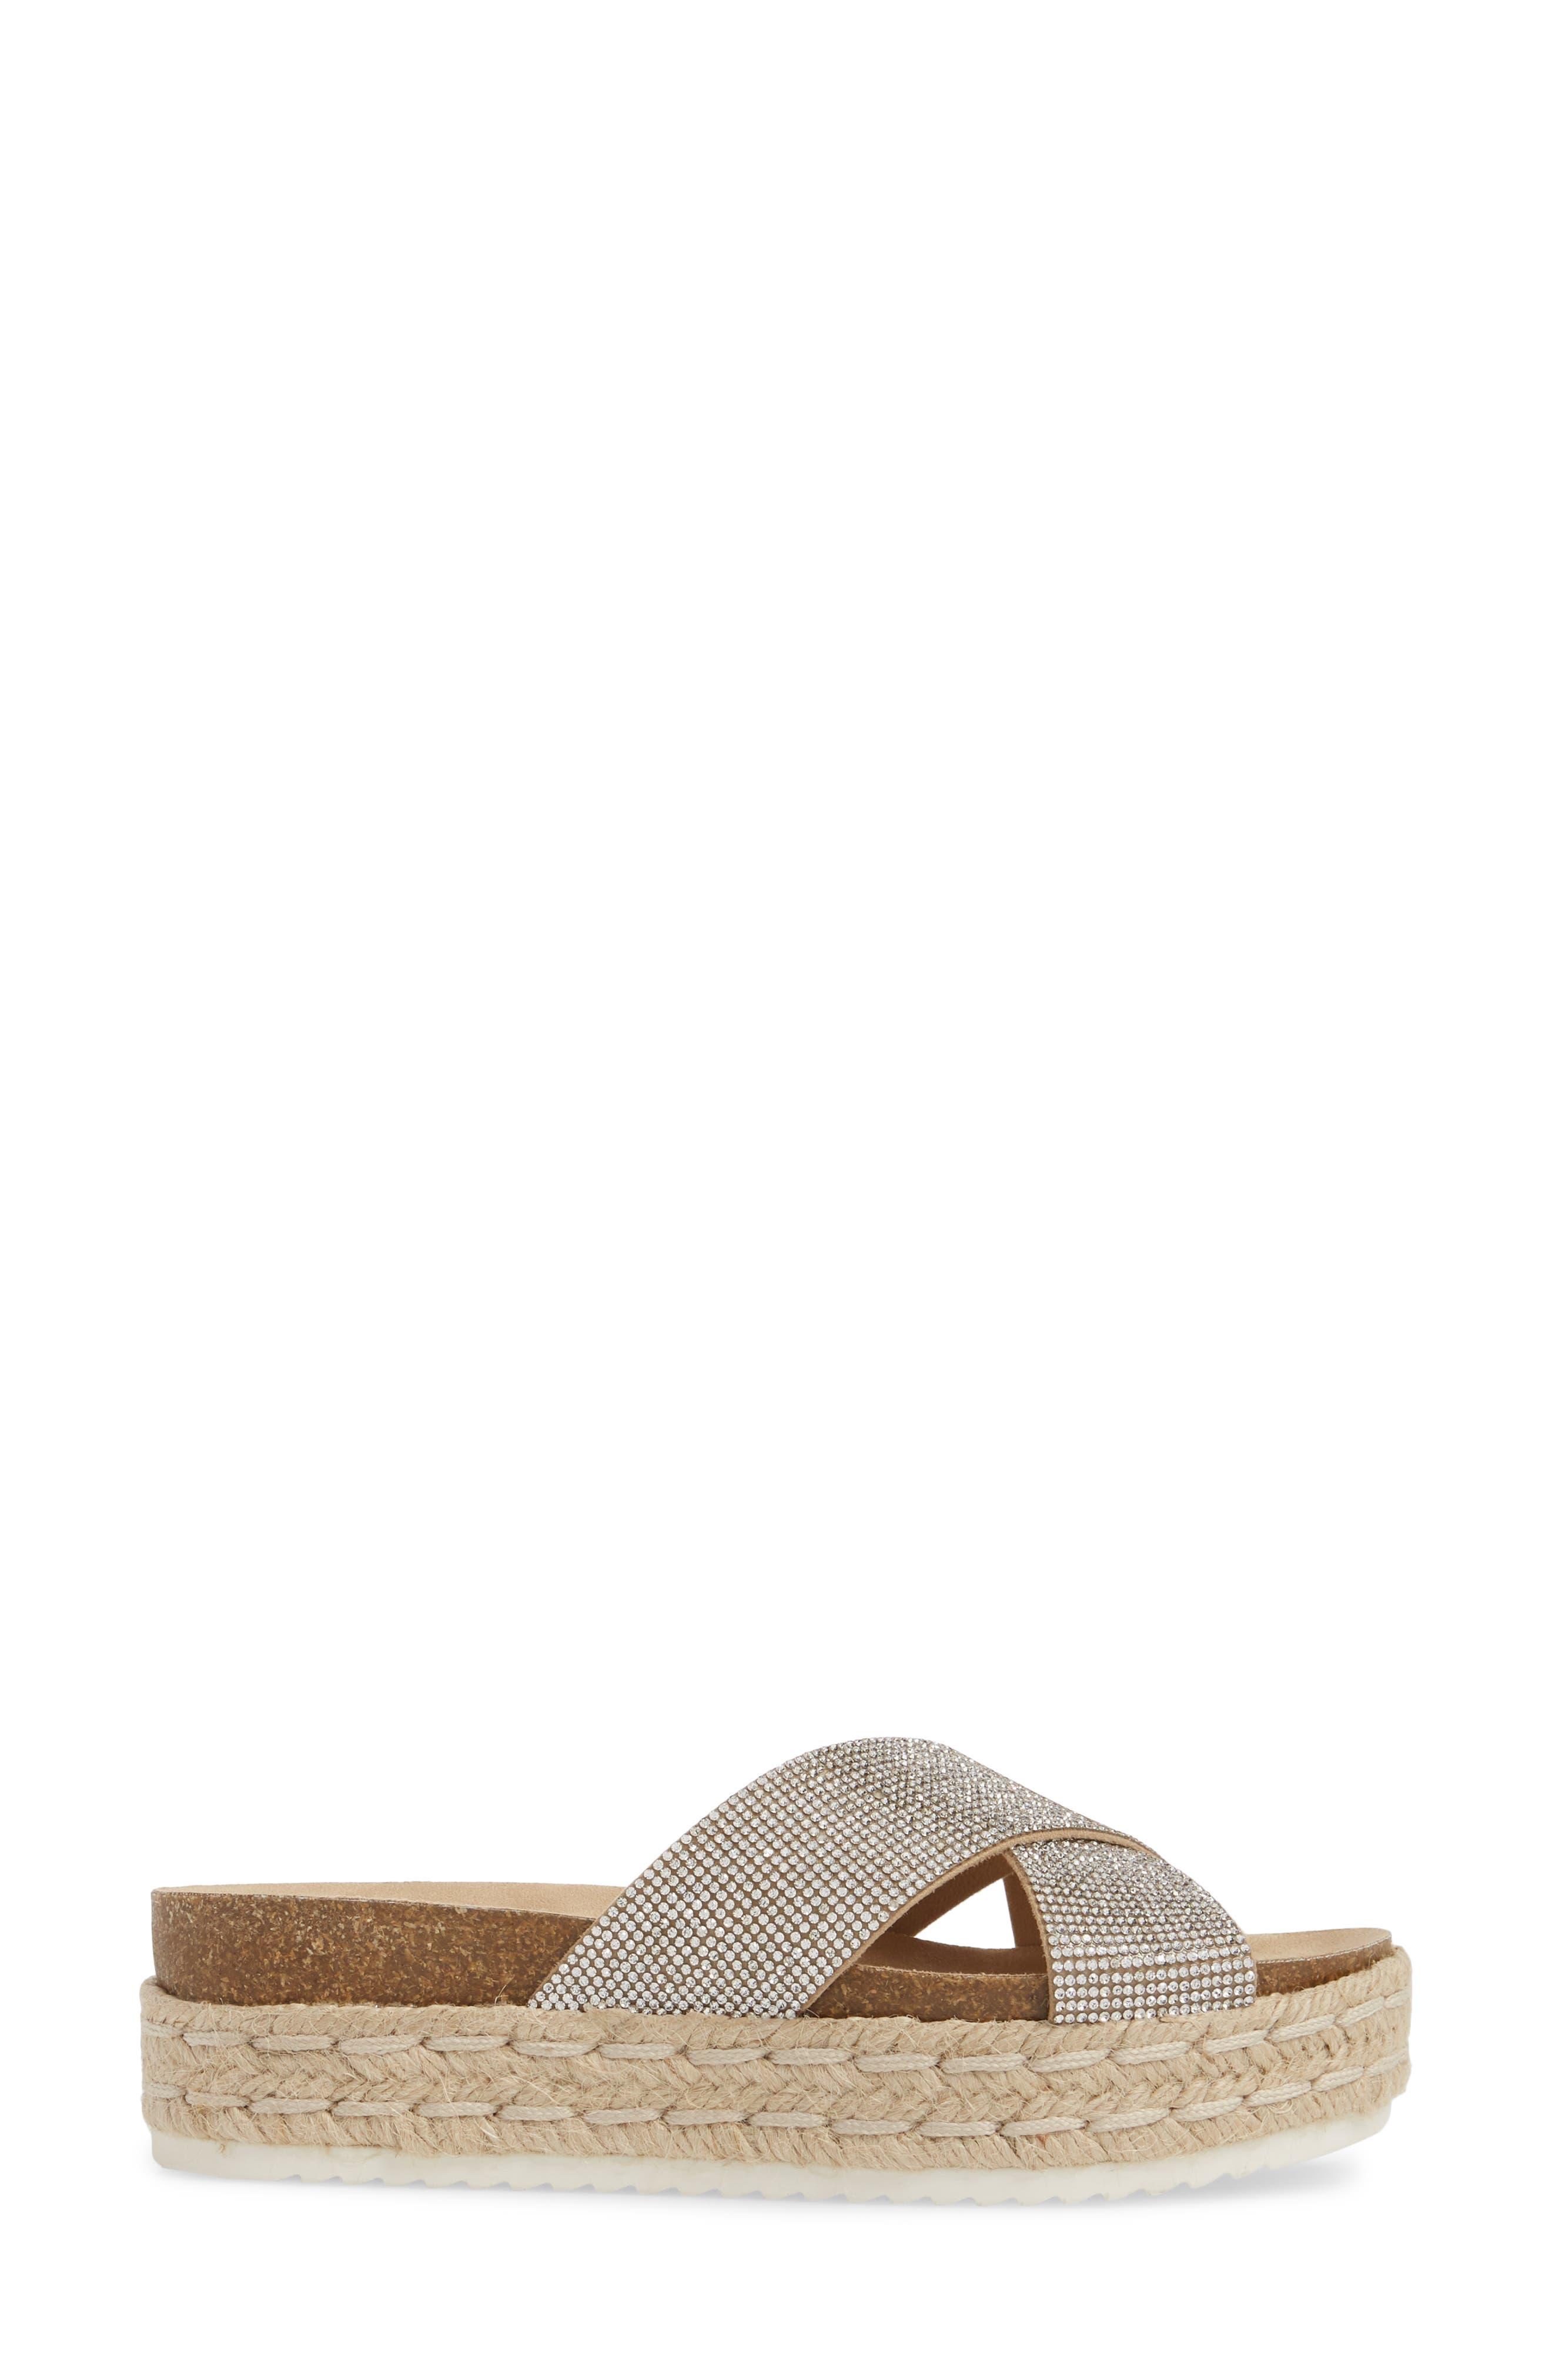 Arran-R Platform Espadrille Sandal,                             Alternate thumbnail 3, color,                             Silver